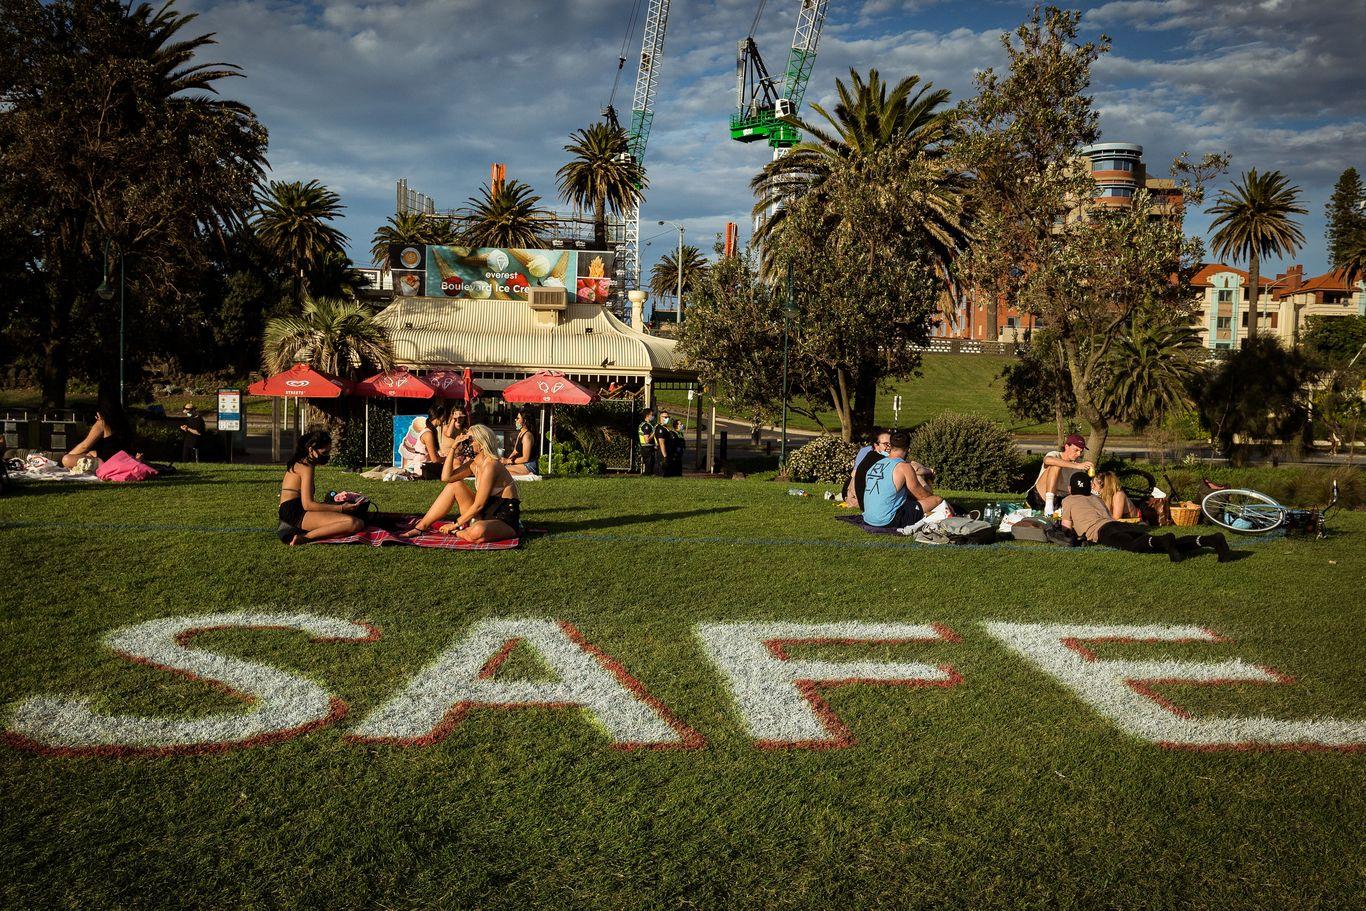 Australian city Melbourne to exit one of world's longest lockdowns thumbnail